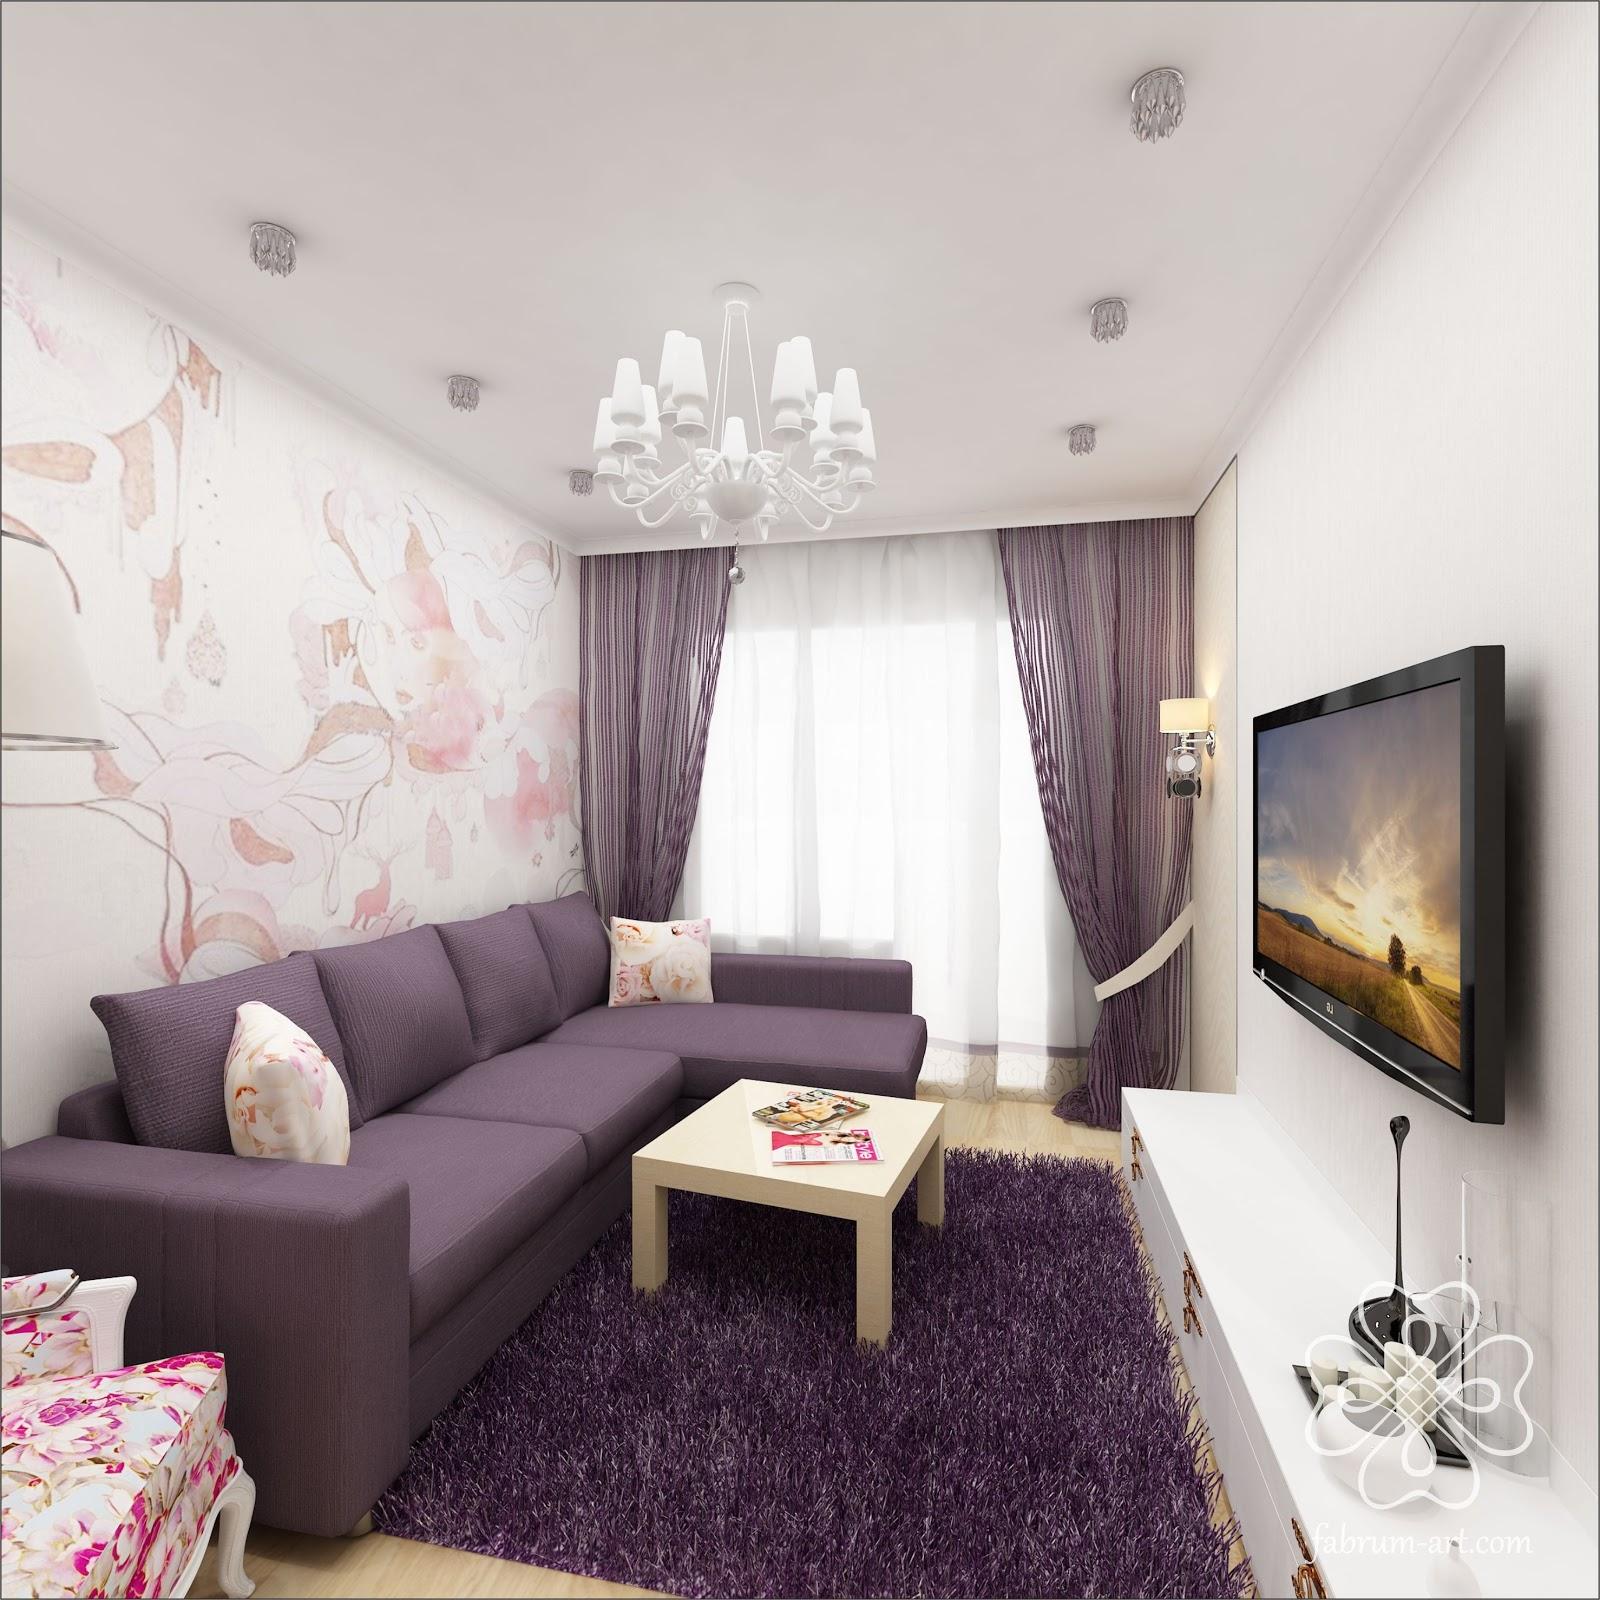 Фото дизайн квартиры 106 серии